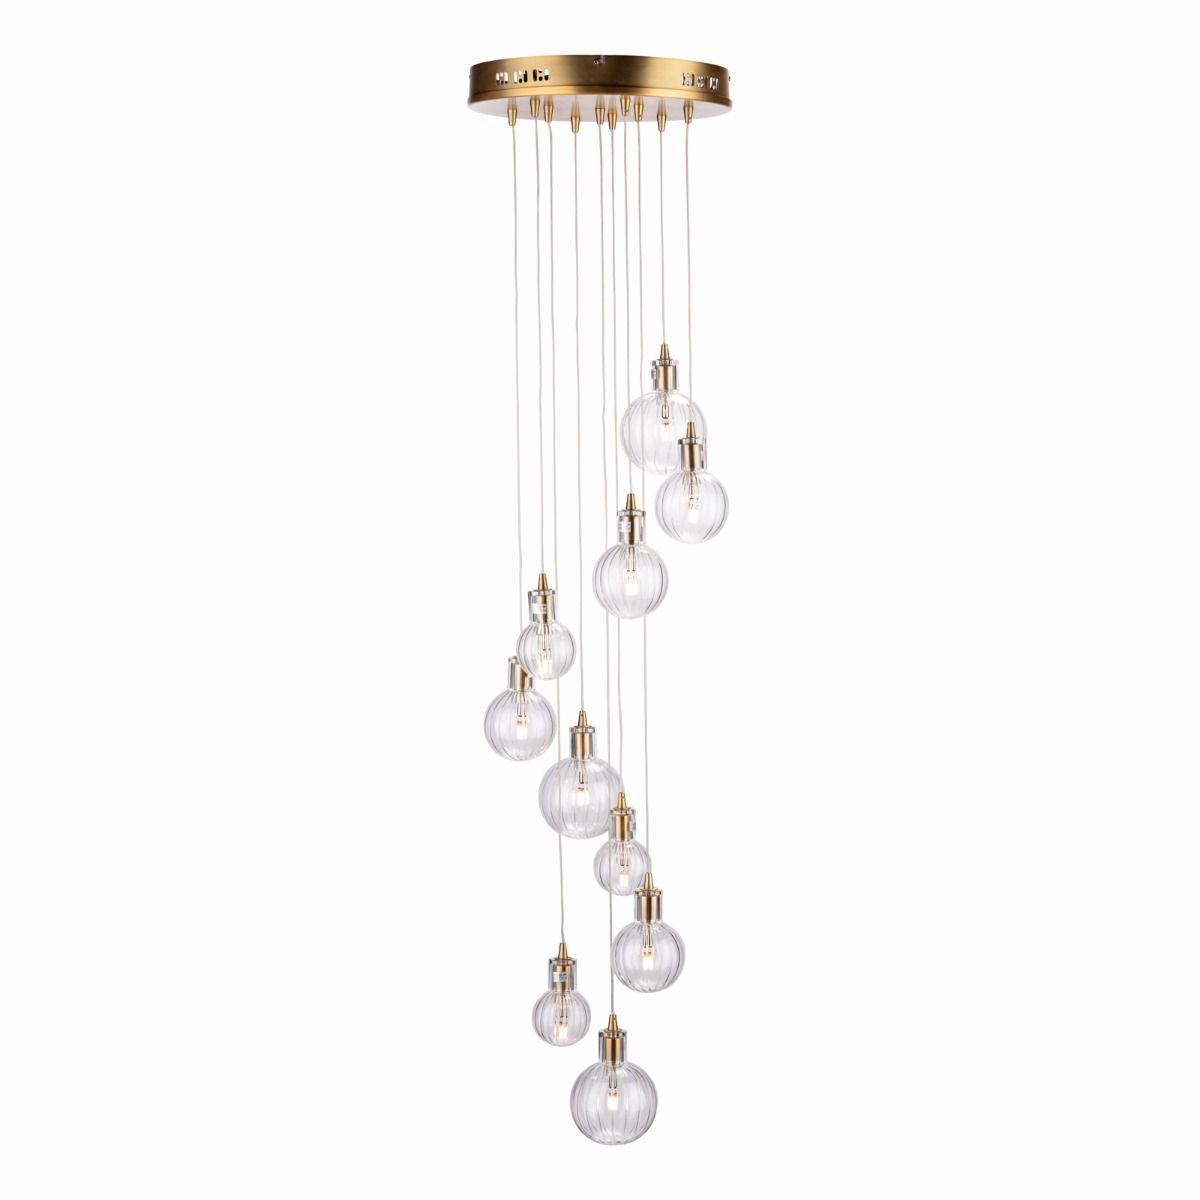 Dita 10 Light Cluster Pendant Brass & Glass